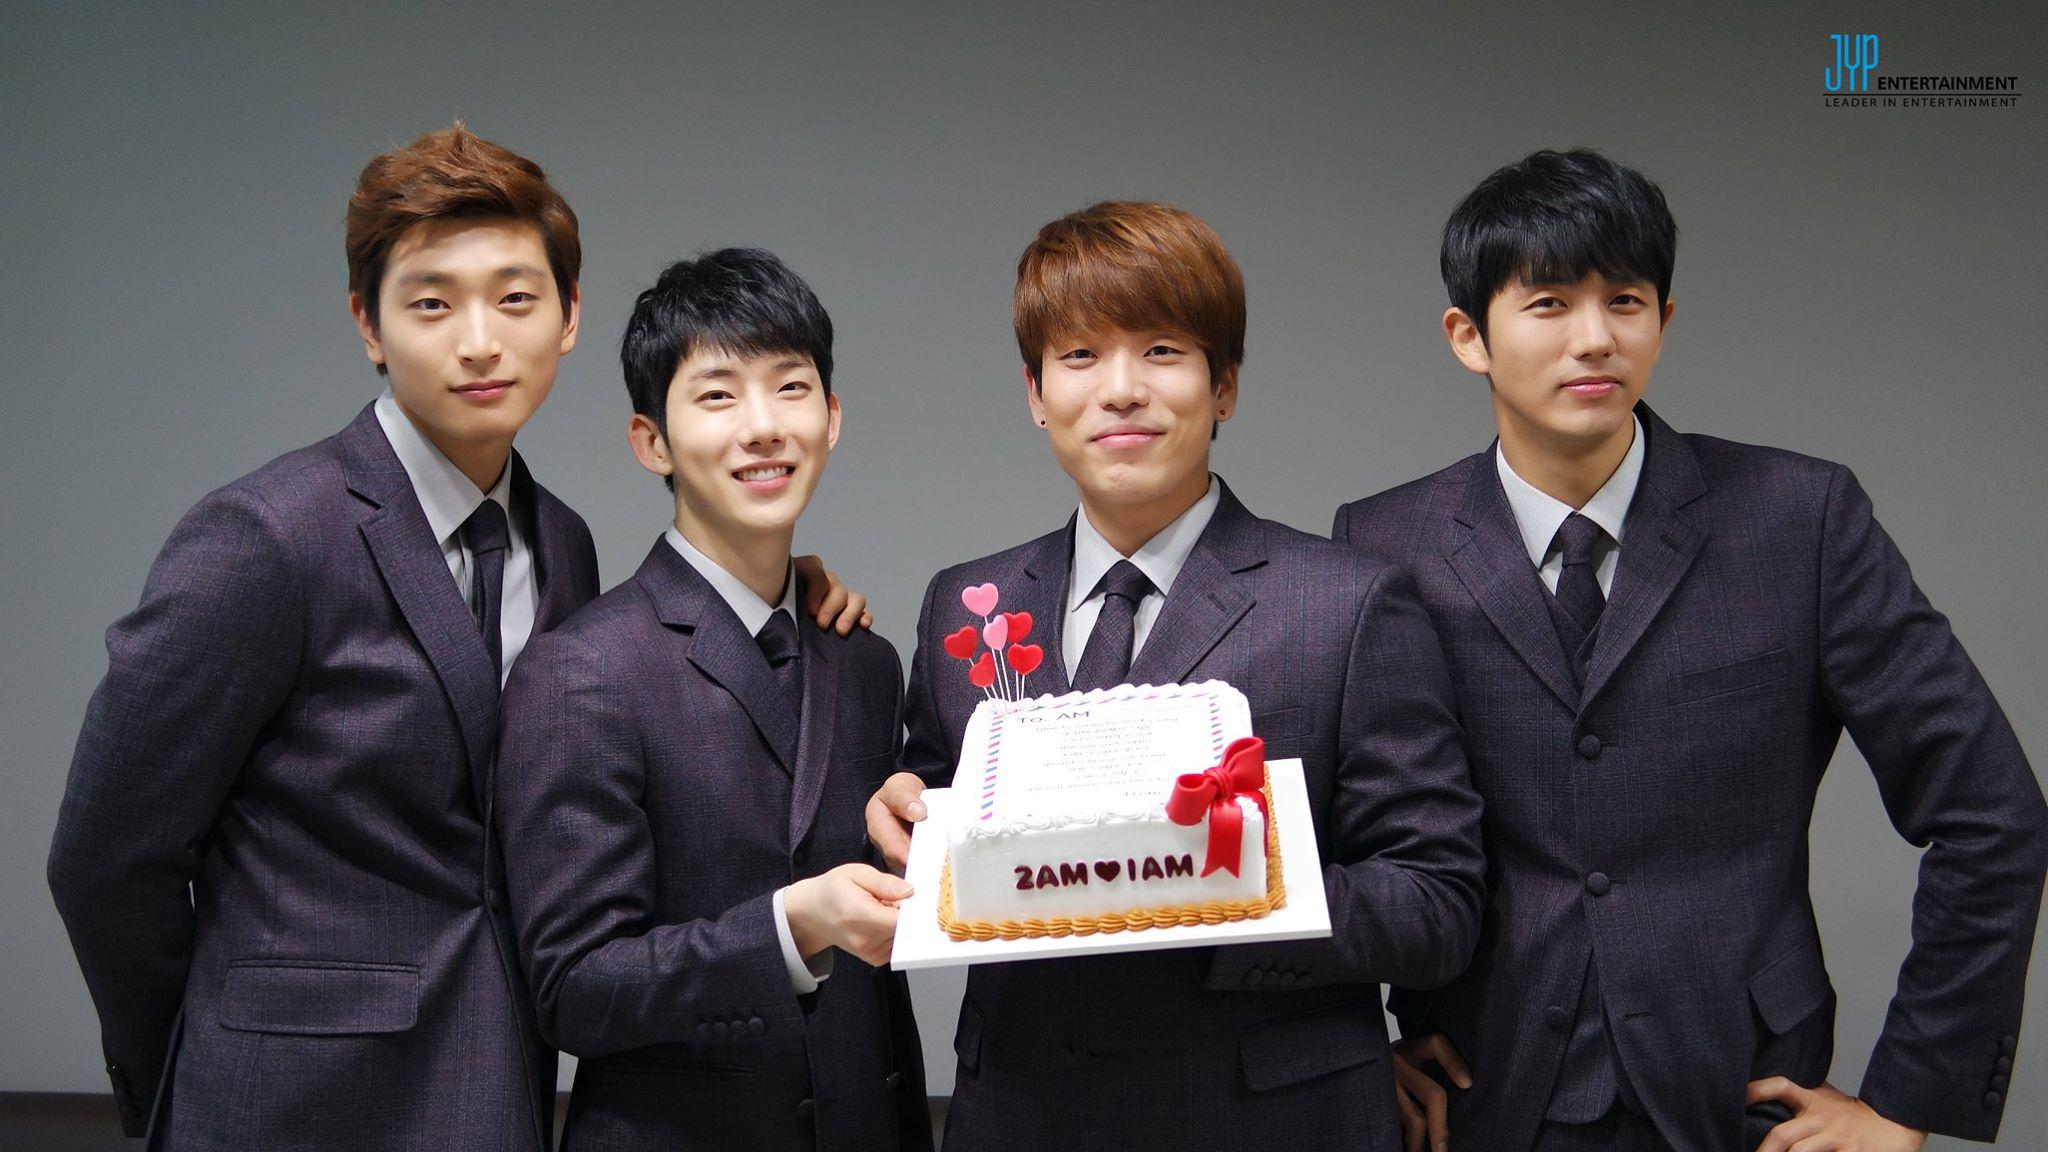 2AM,韓國美聲團體